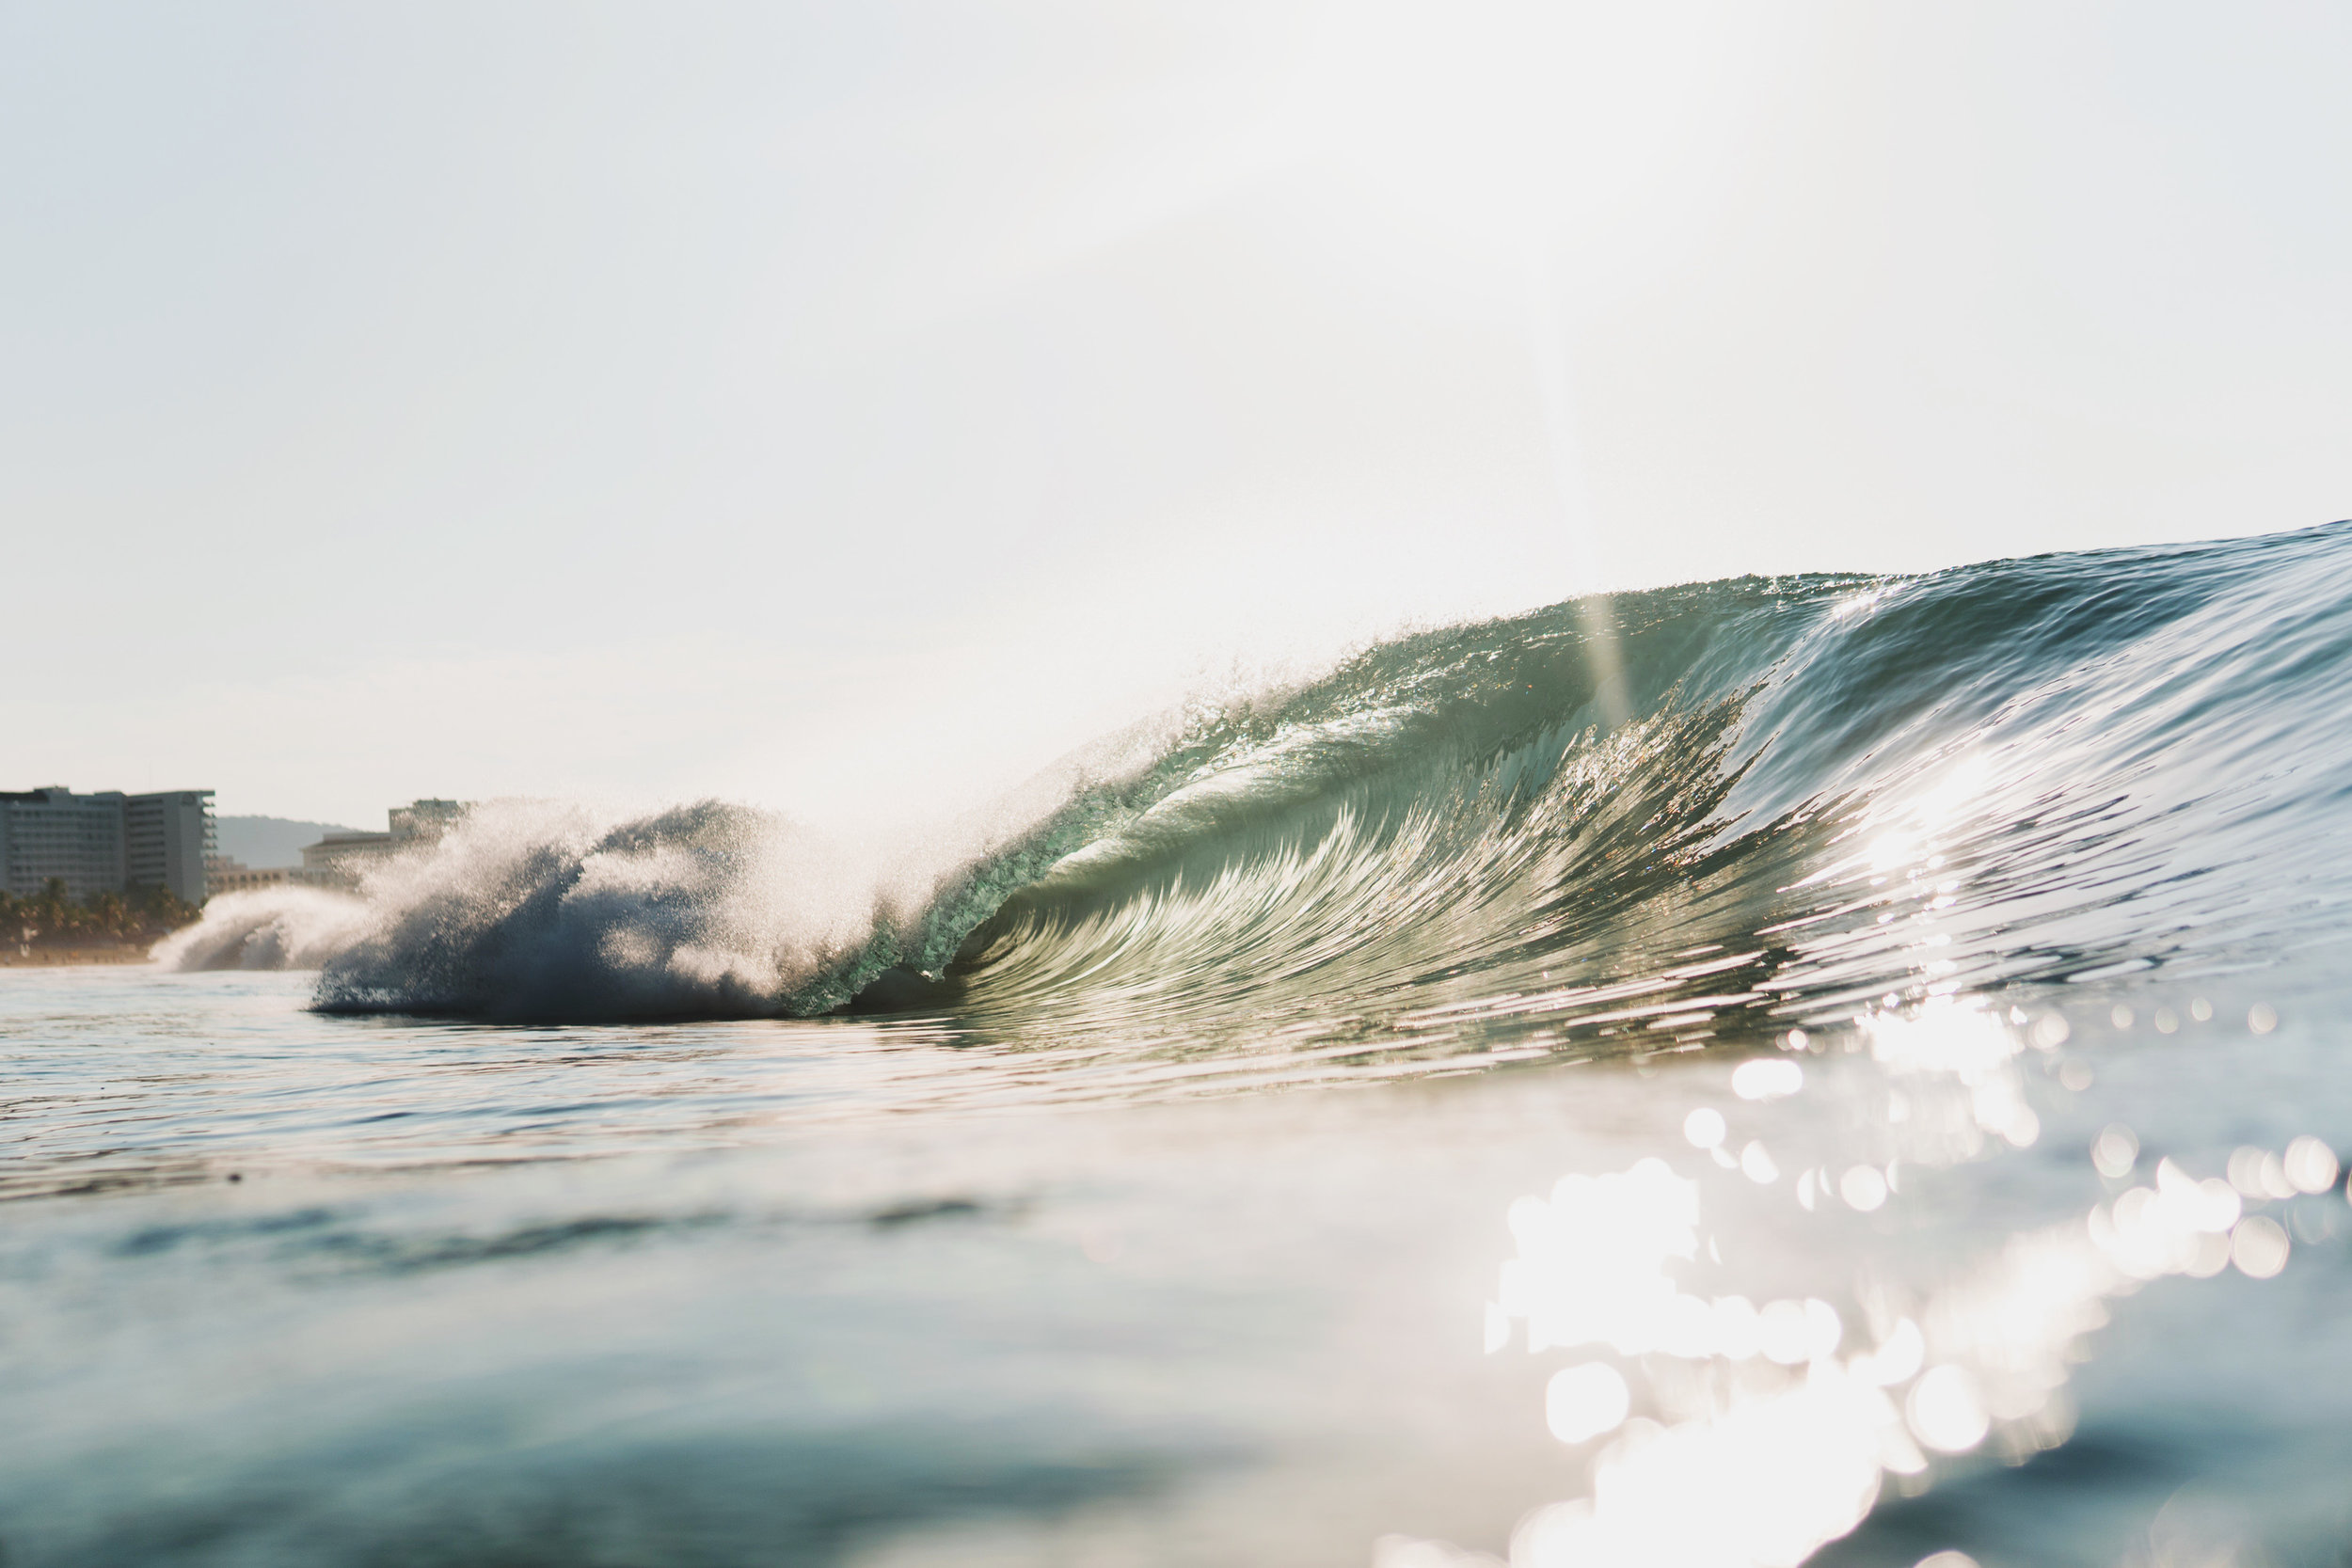 Surf-Mexico-Zihuatanejo-Sayulita-Ixtapa-Zihuatanejo-Diego-Cadena-Olas-Fotografia-Heiko-Bothe-47.jpg